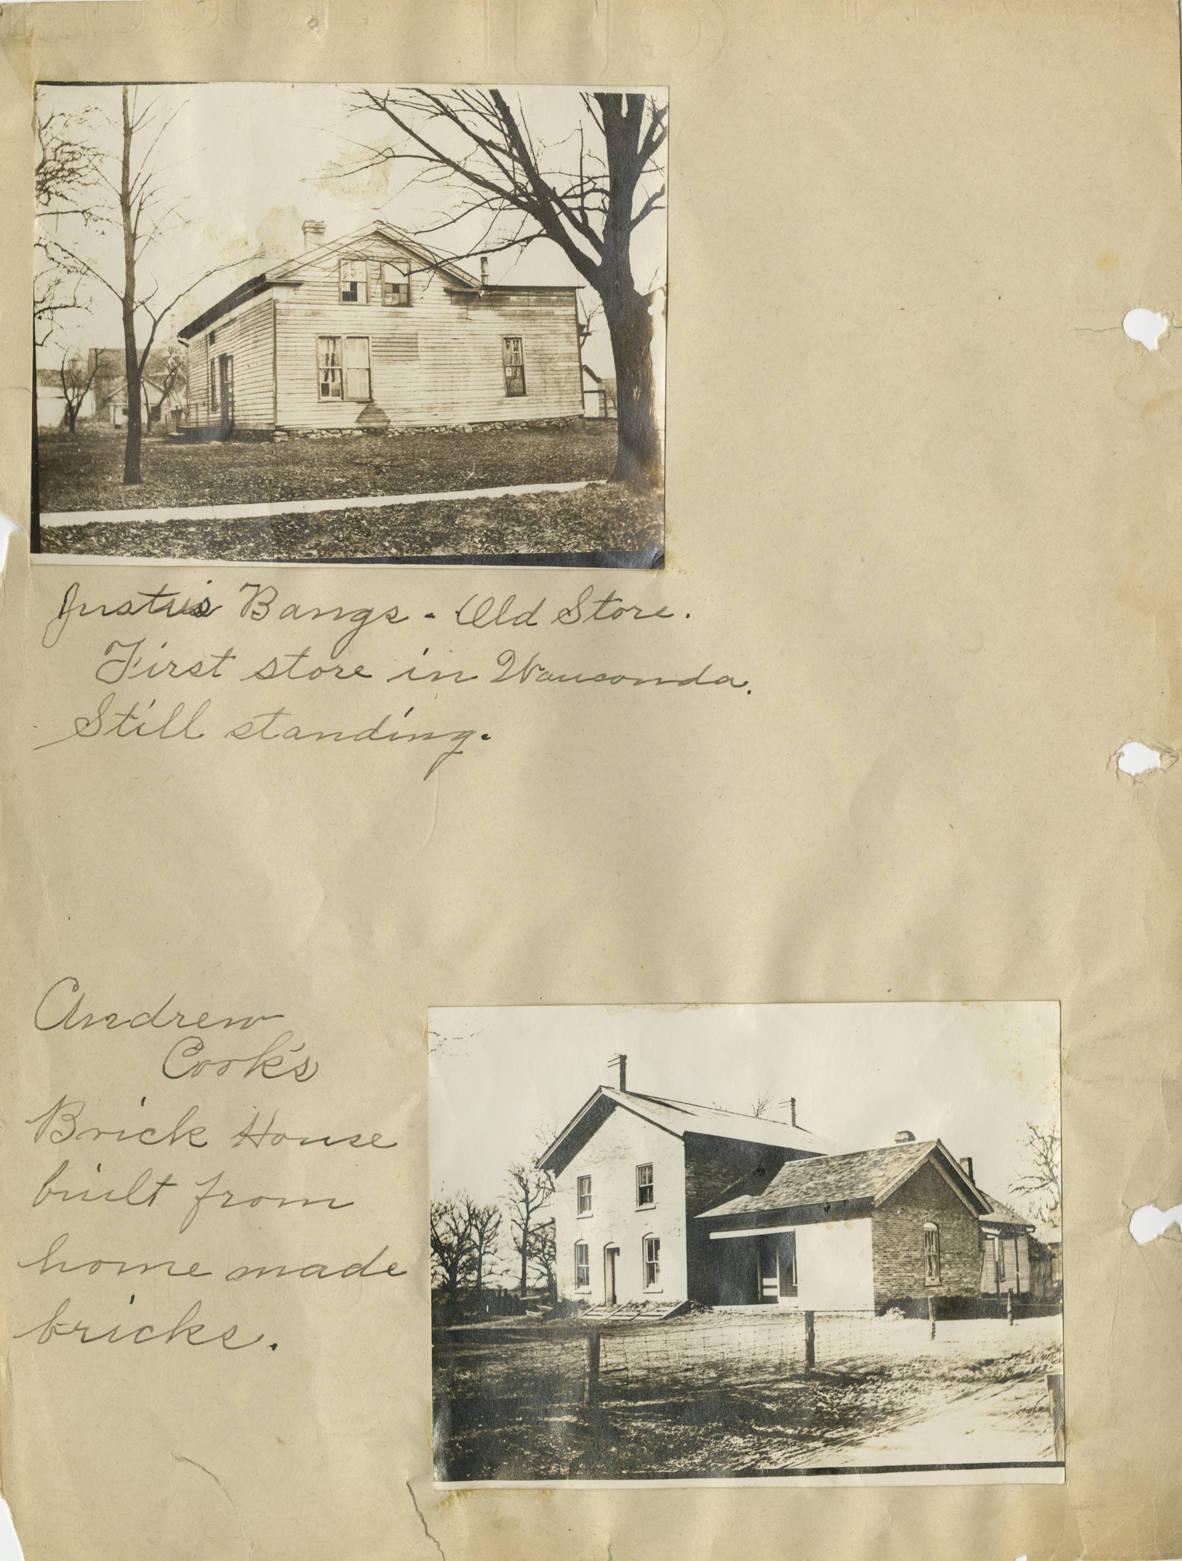 C:\Users\Vern\Documents\Fort Hill\1918 Schools Centennial\1918 Wauconda Twp Glynch School\1918_School_Histories__Wauconda_Township__Glynch_School_2003045_Page_3.jpg